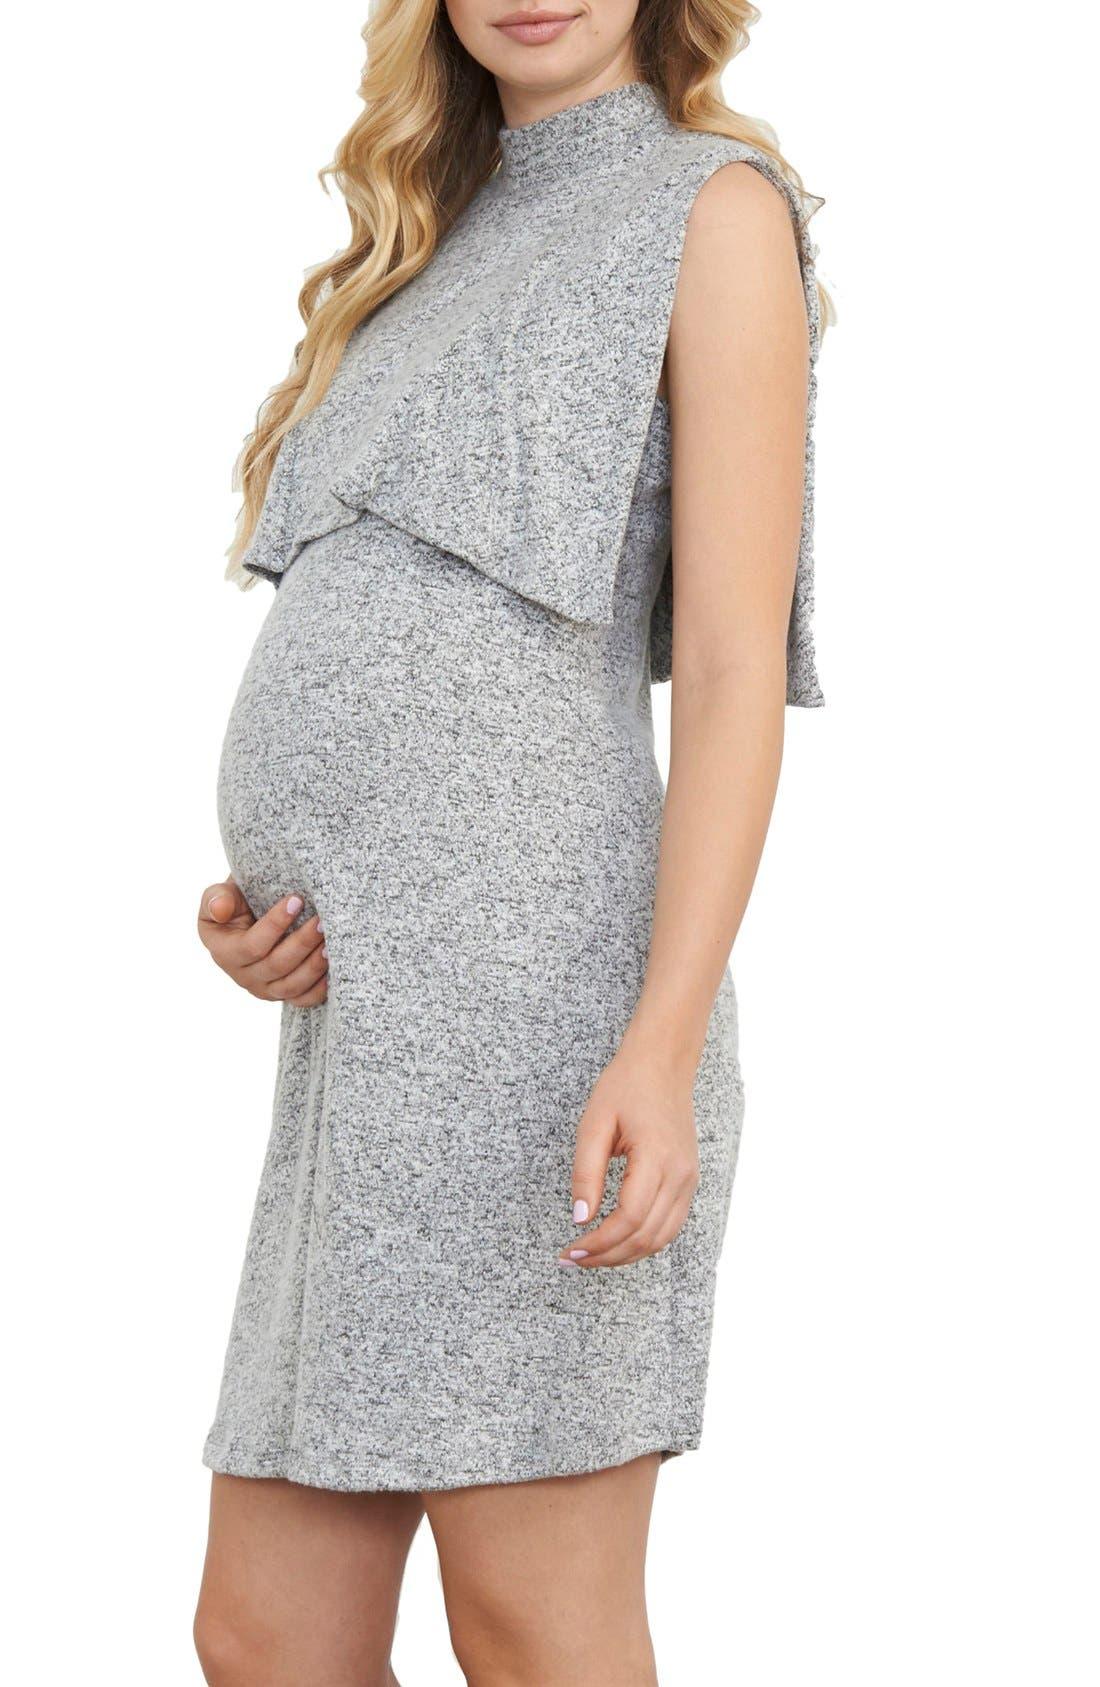 Maternal America Sleeveless Maternity/nursing Dress